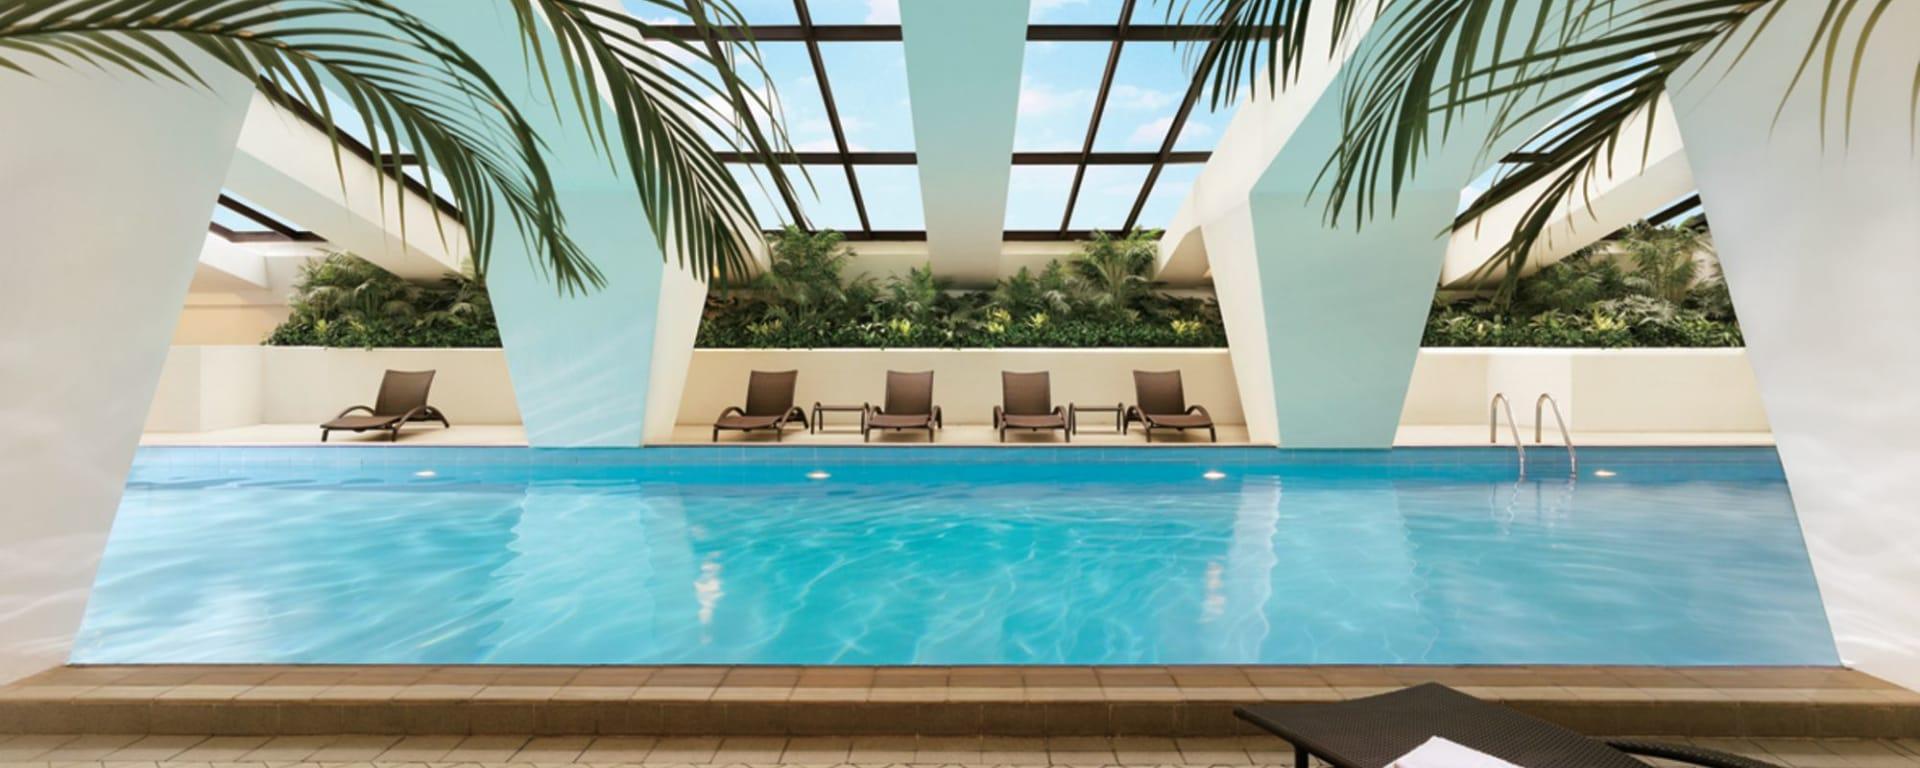 Royal Macau à Macao: Swimming Pool Day